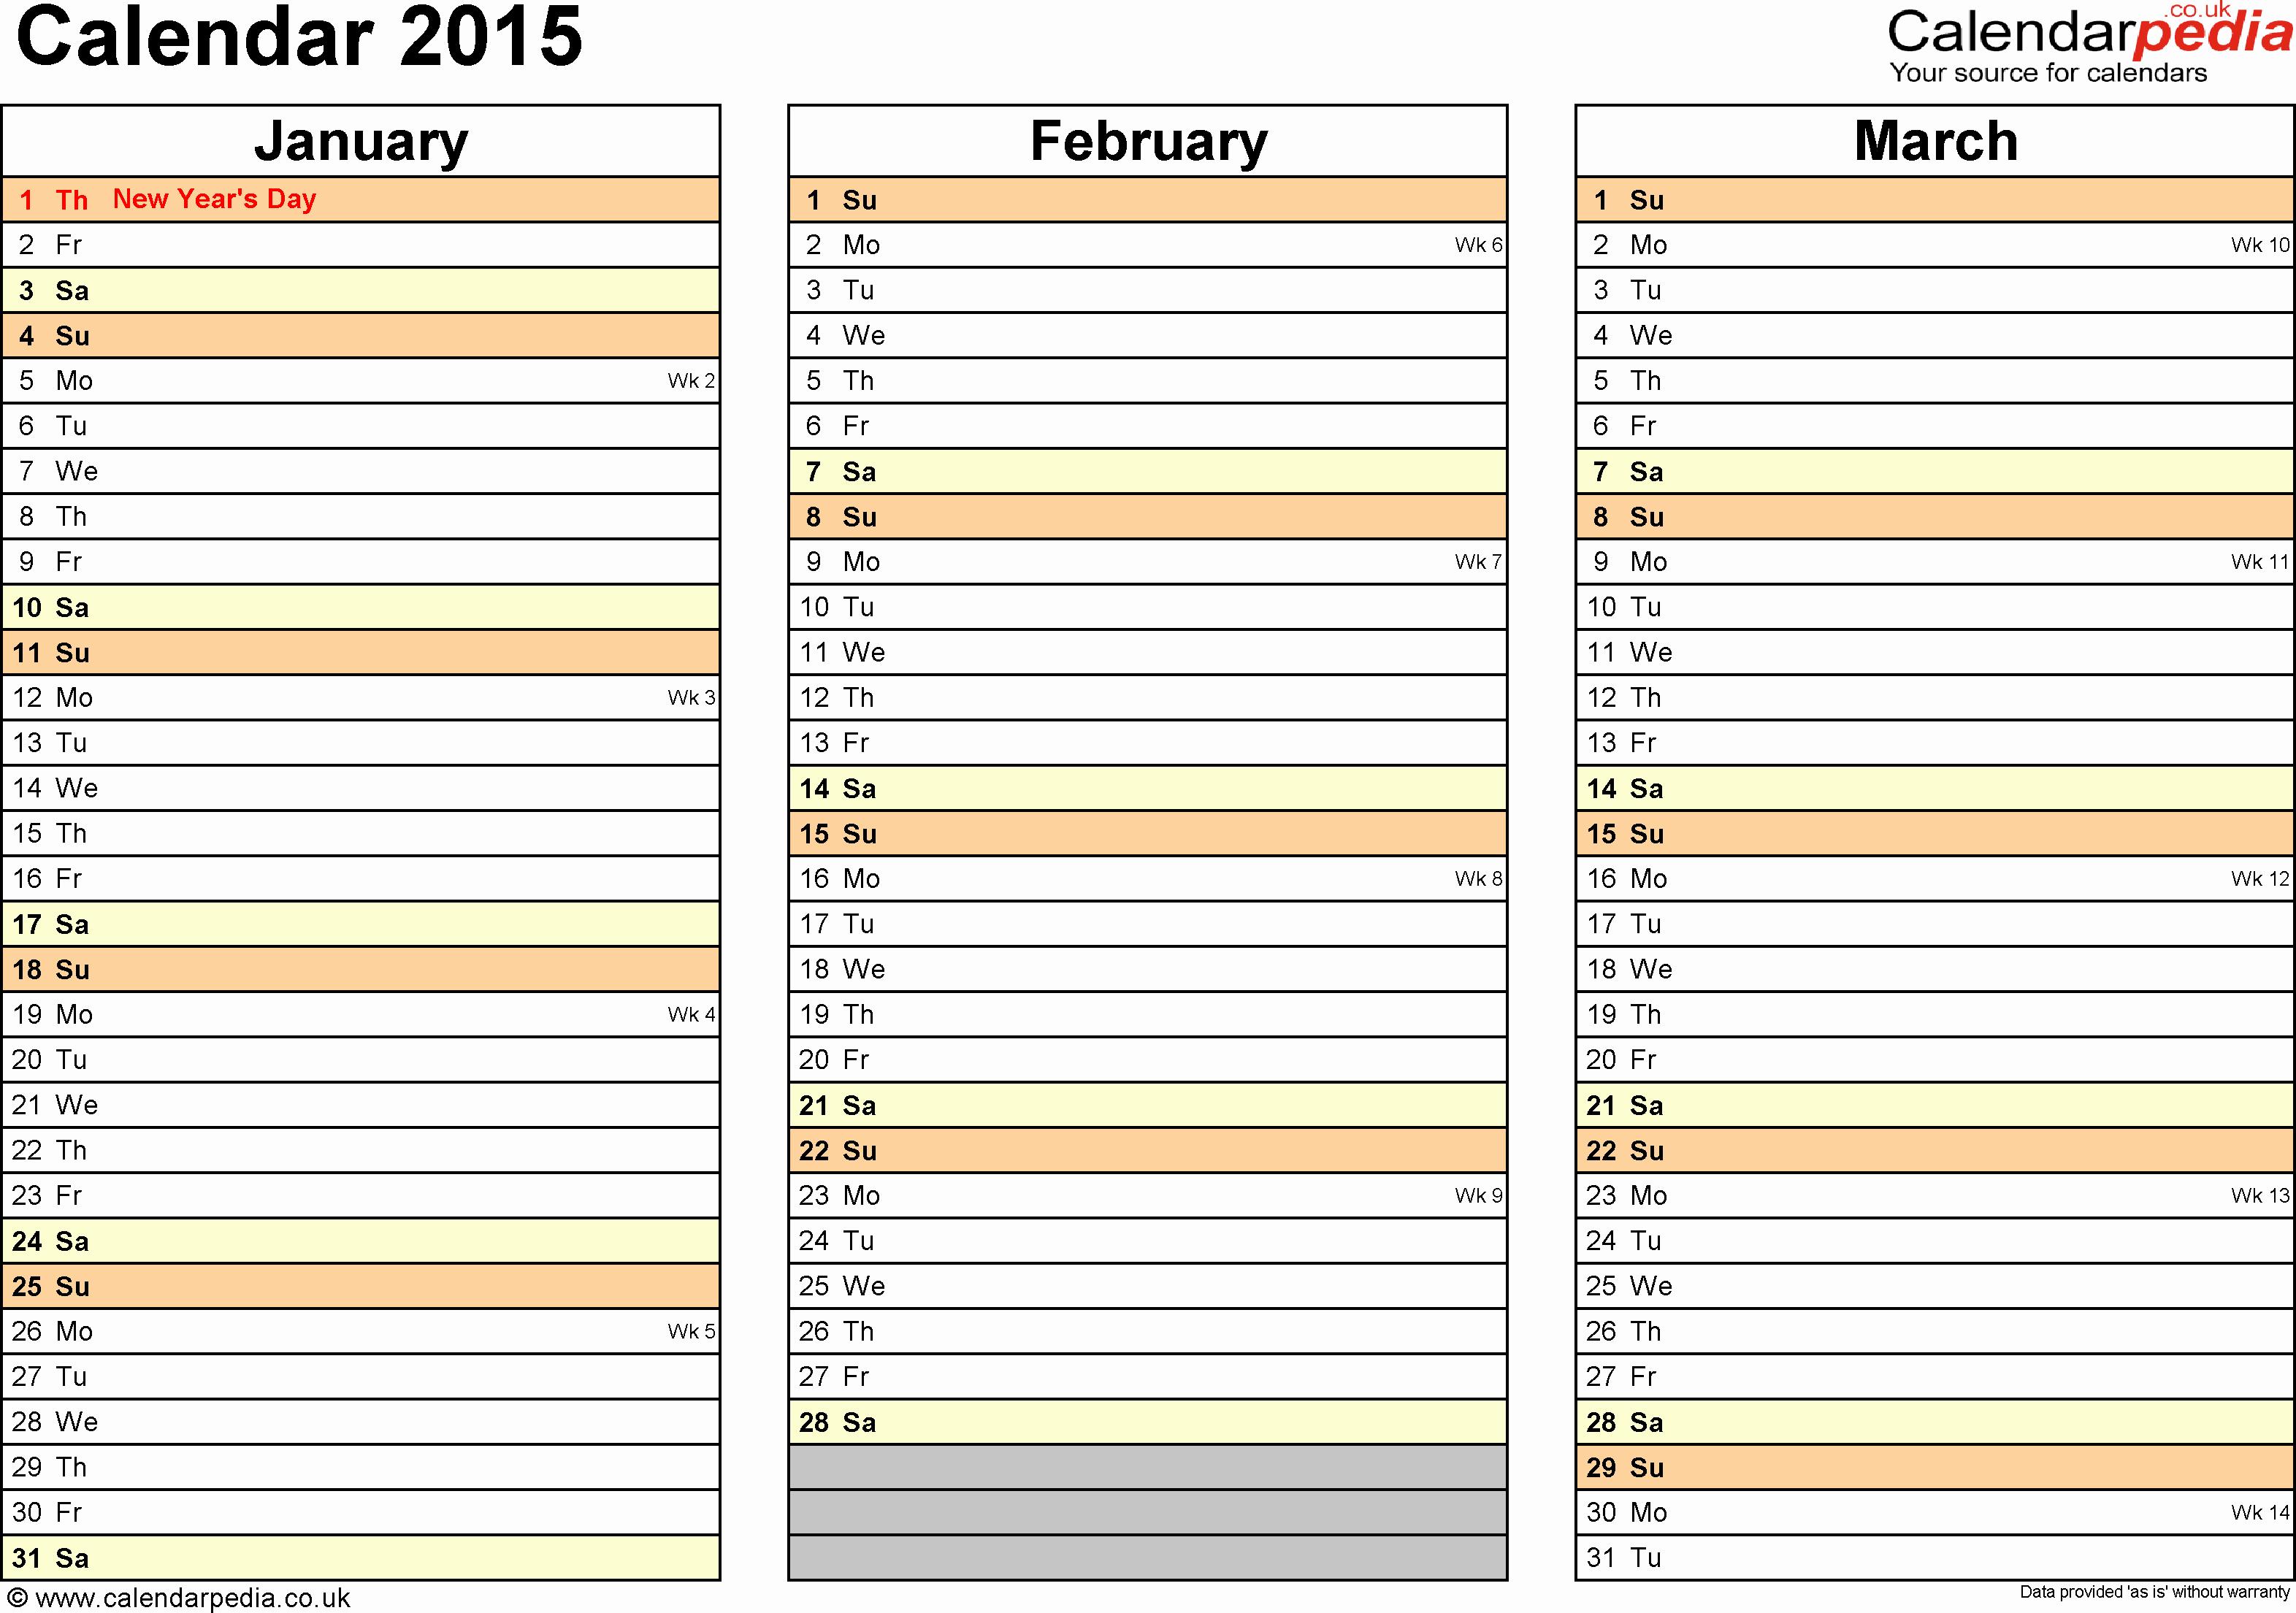 Free 2015 Yearly Calendar Template Beautiful Calendar 2015 Uk 16 Free Printable Pdf Templates